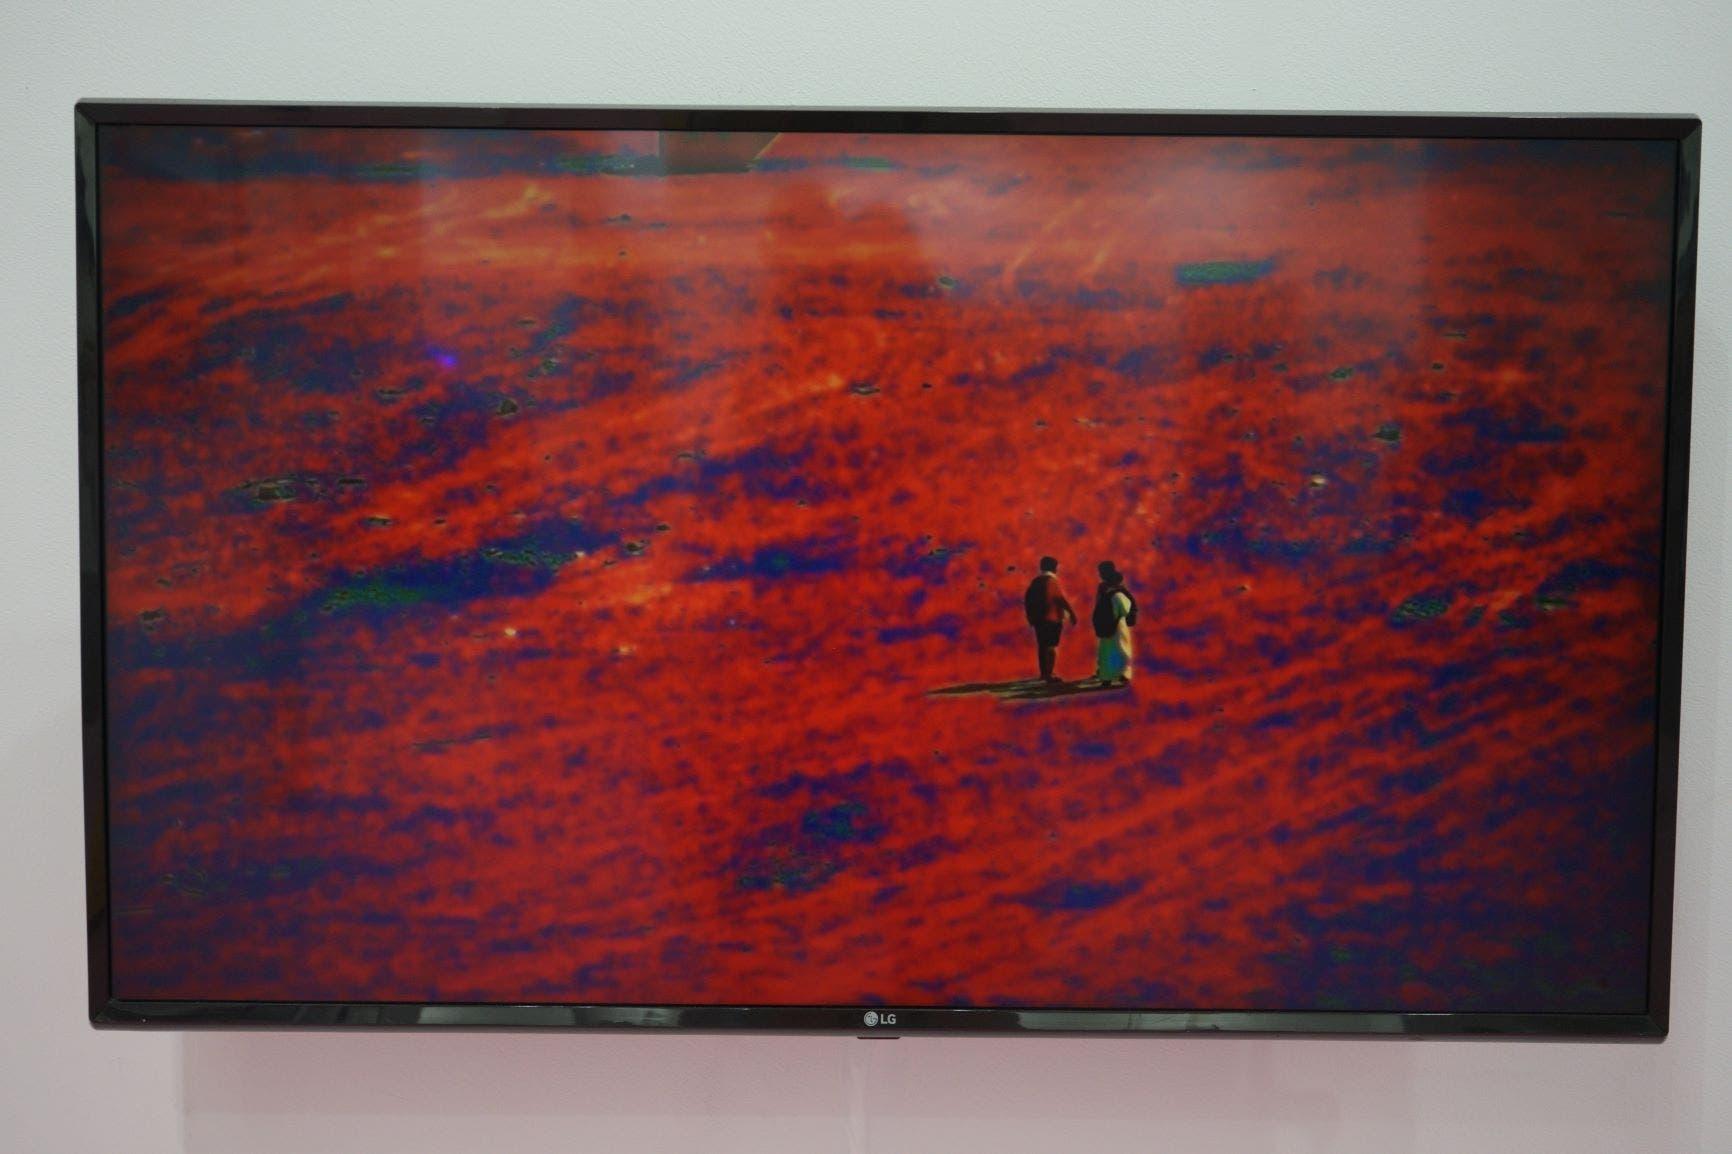 Video installation by Mohammad al-Faraj displayed at the Athr Gallery booth at Art Dubai 2021 in DIFC. (Al Arabiya English)